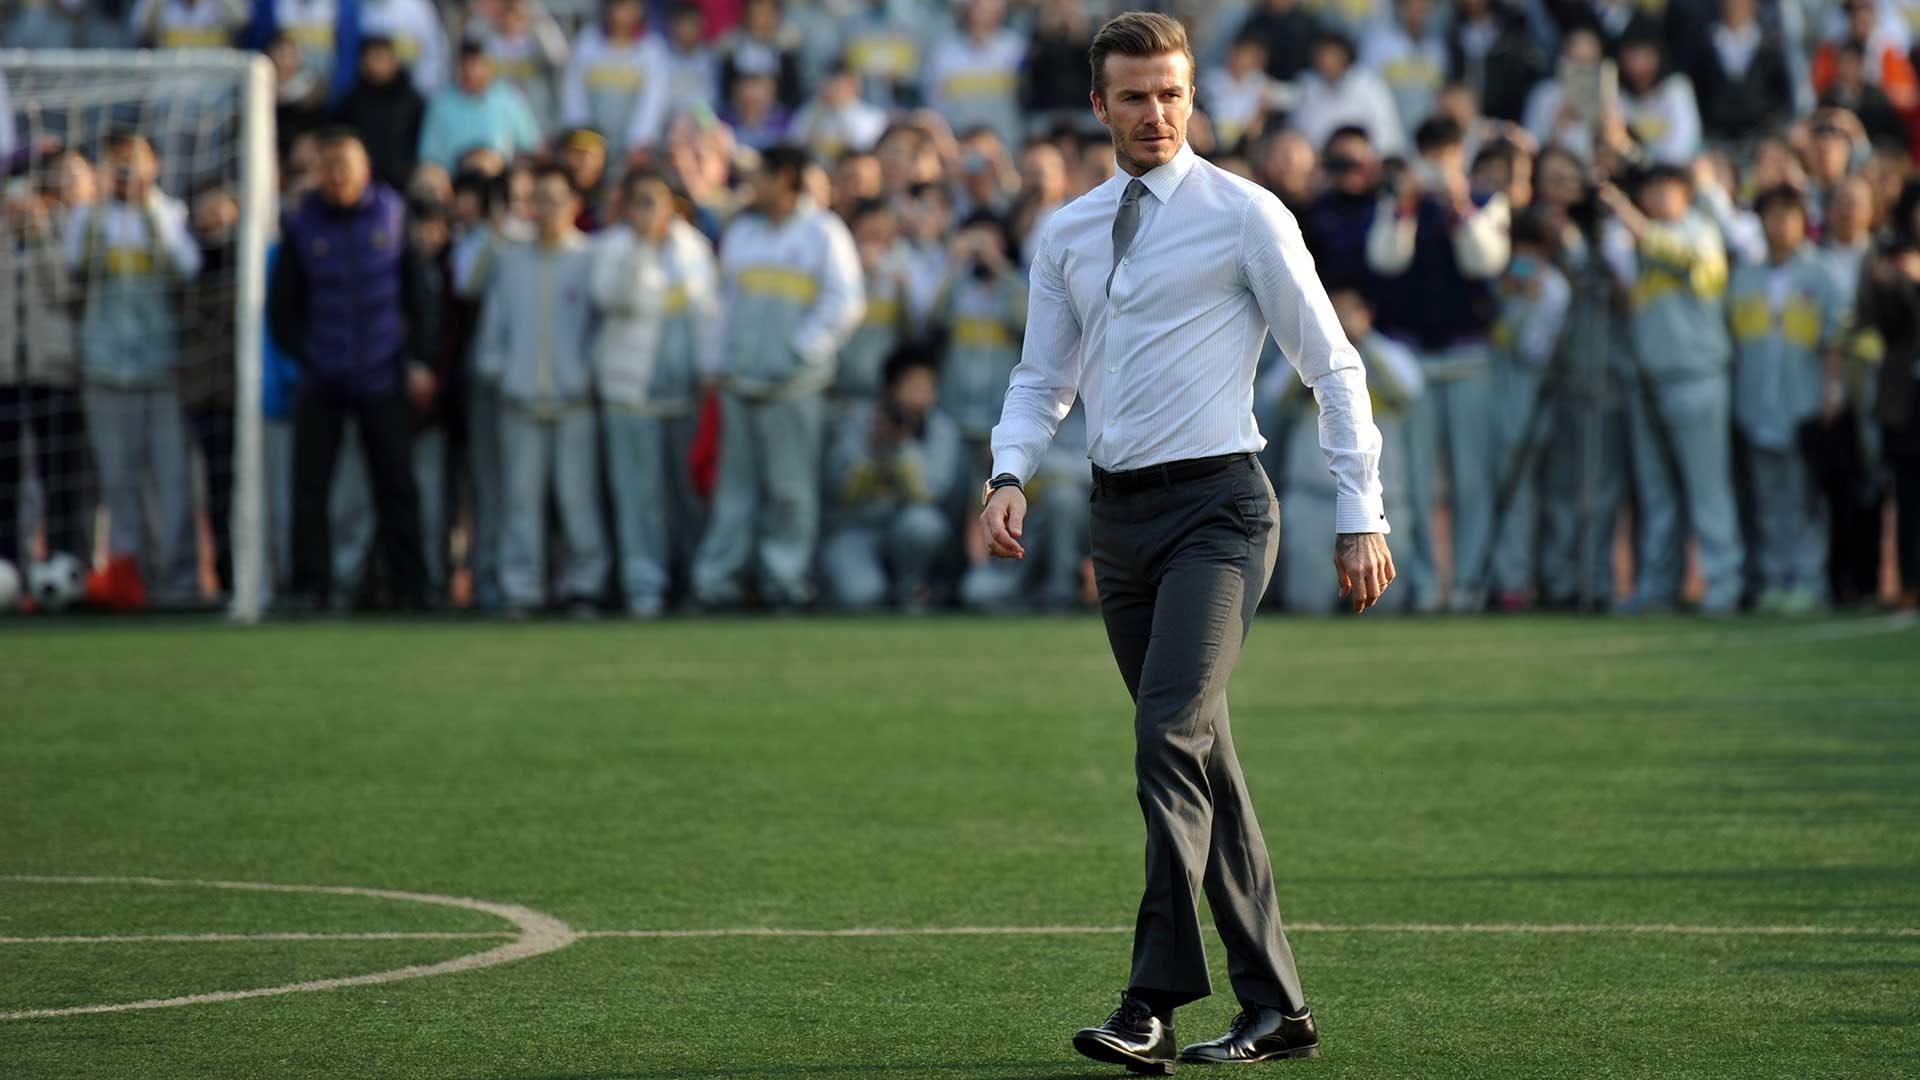 David Beckham, un sueño de niño cumplido